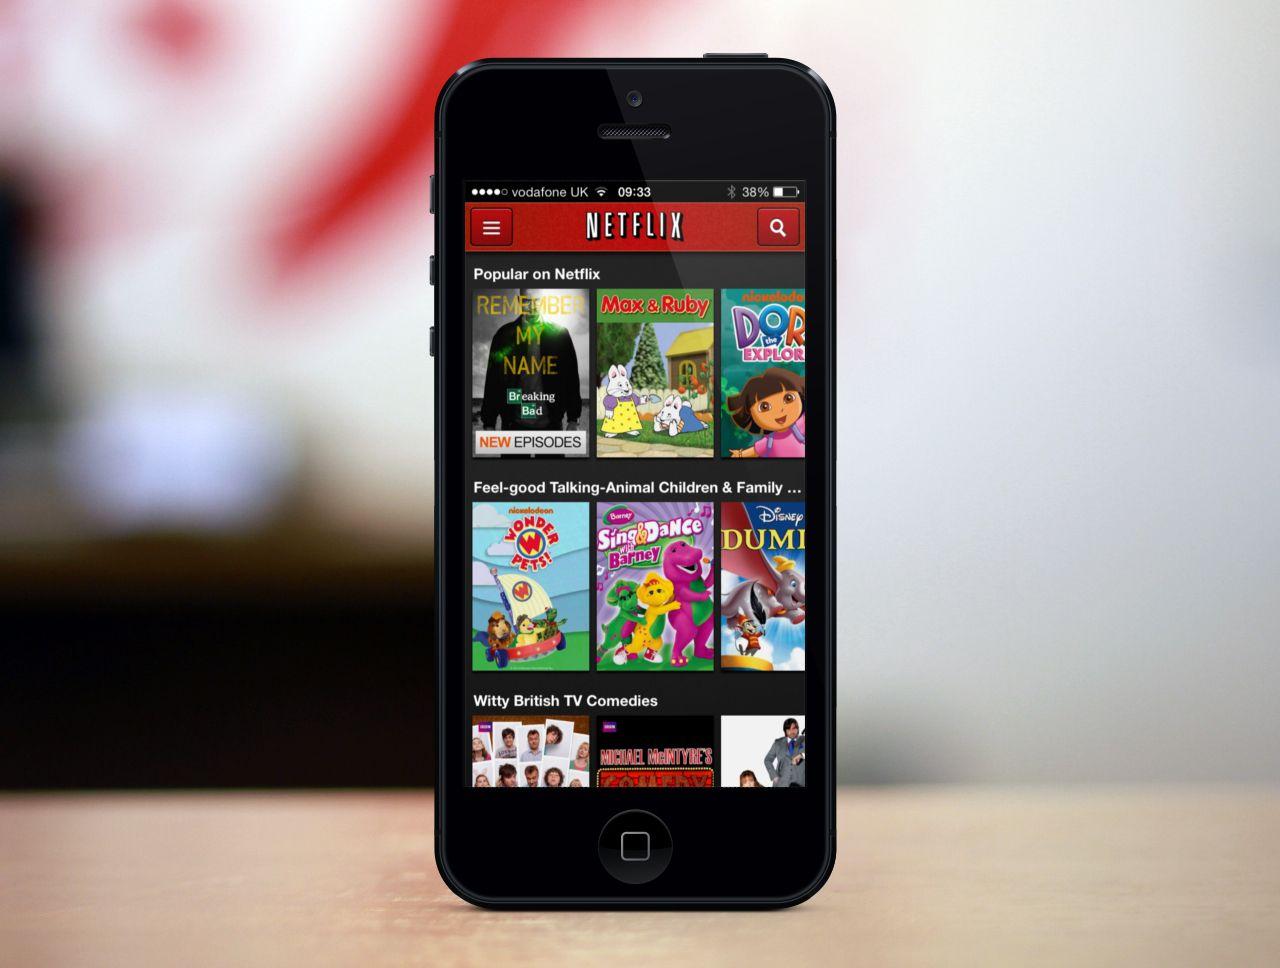 Do you like to binge-watch shows on Netflix?